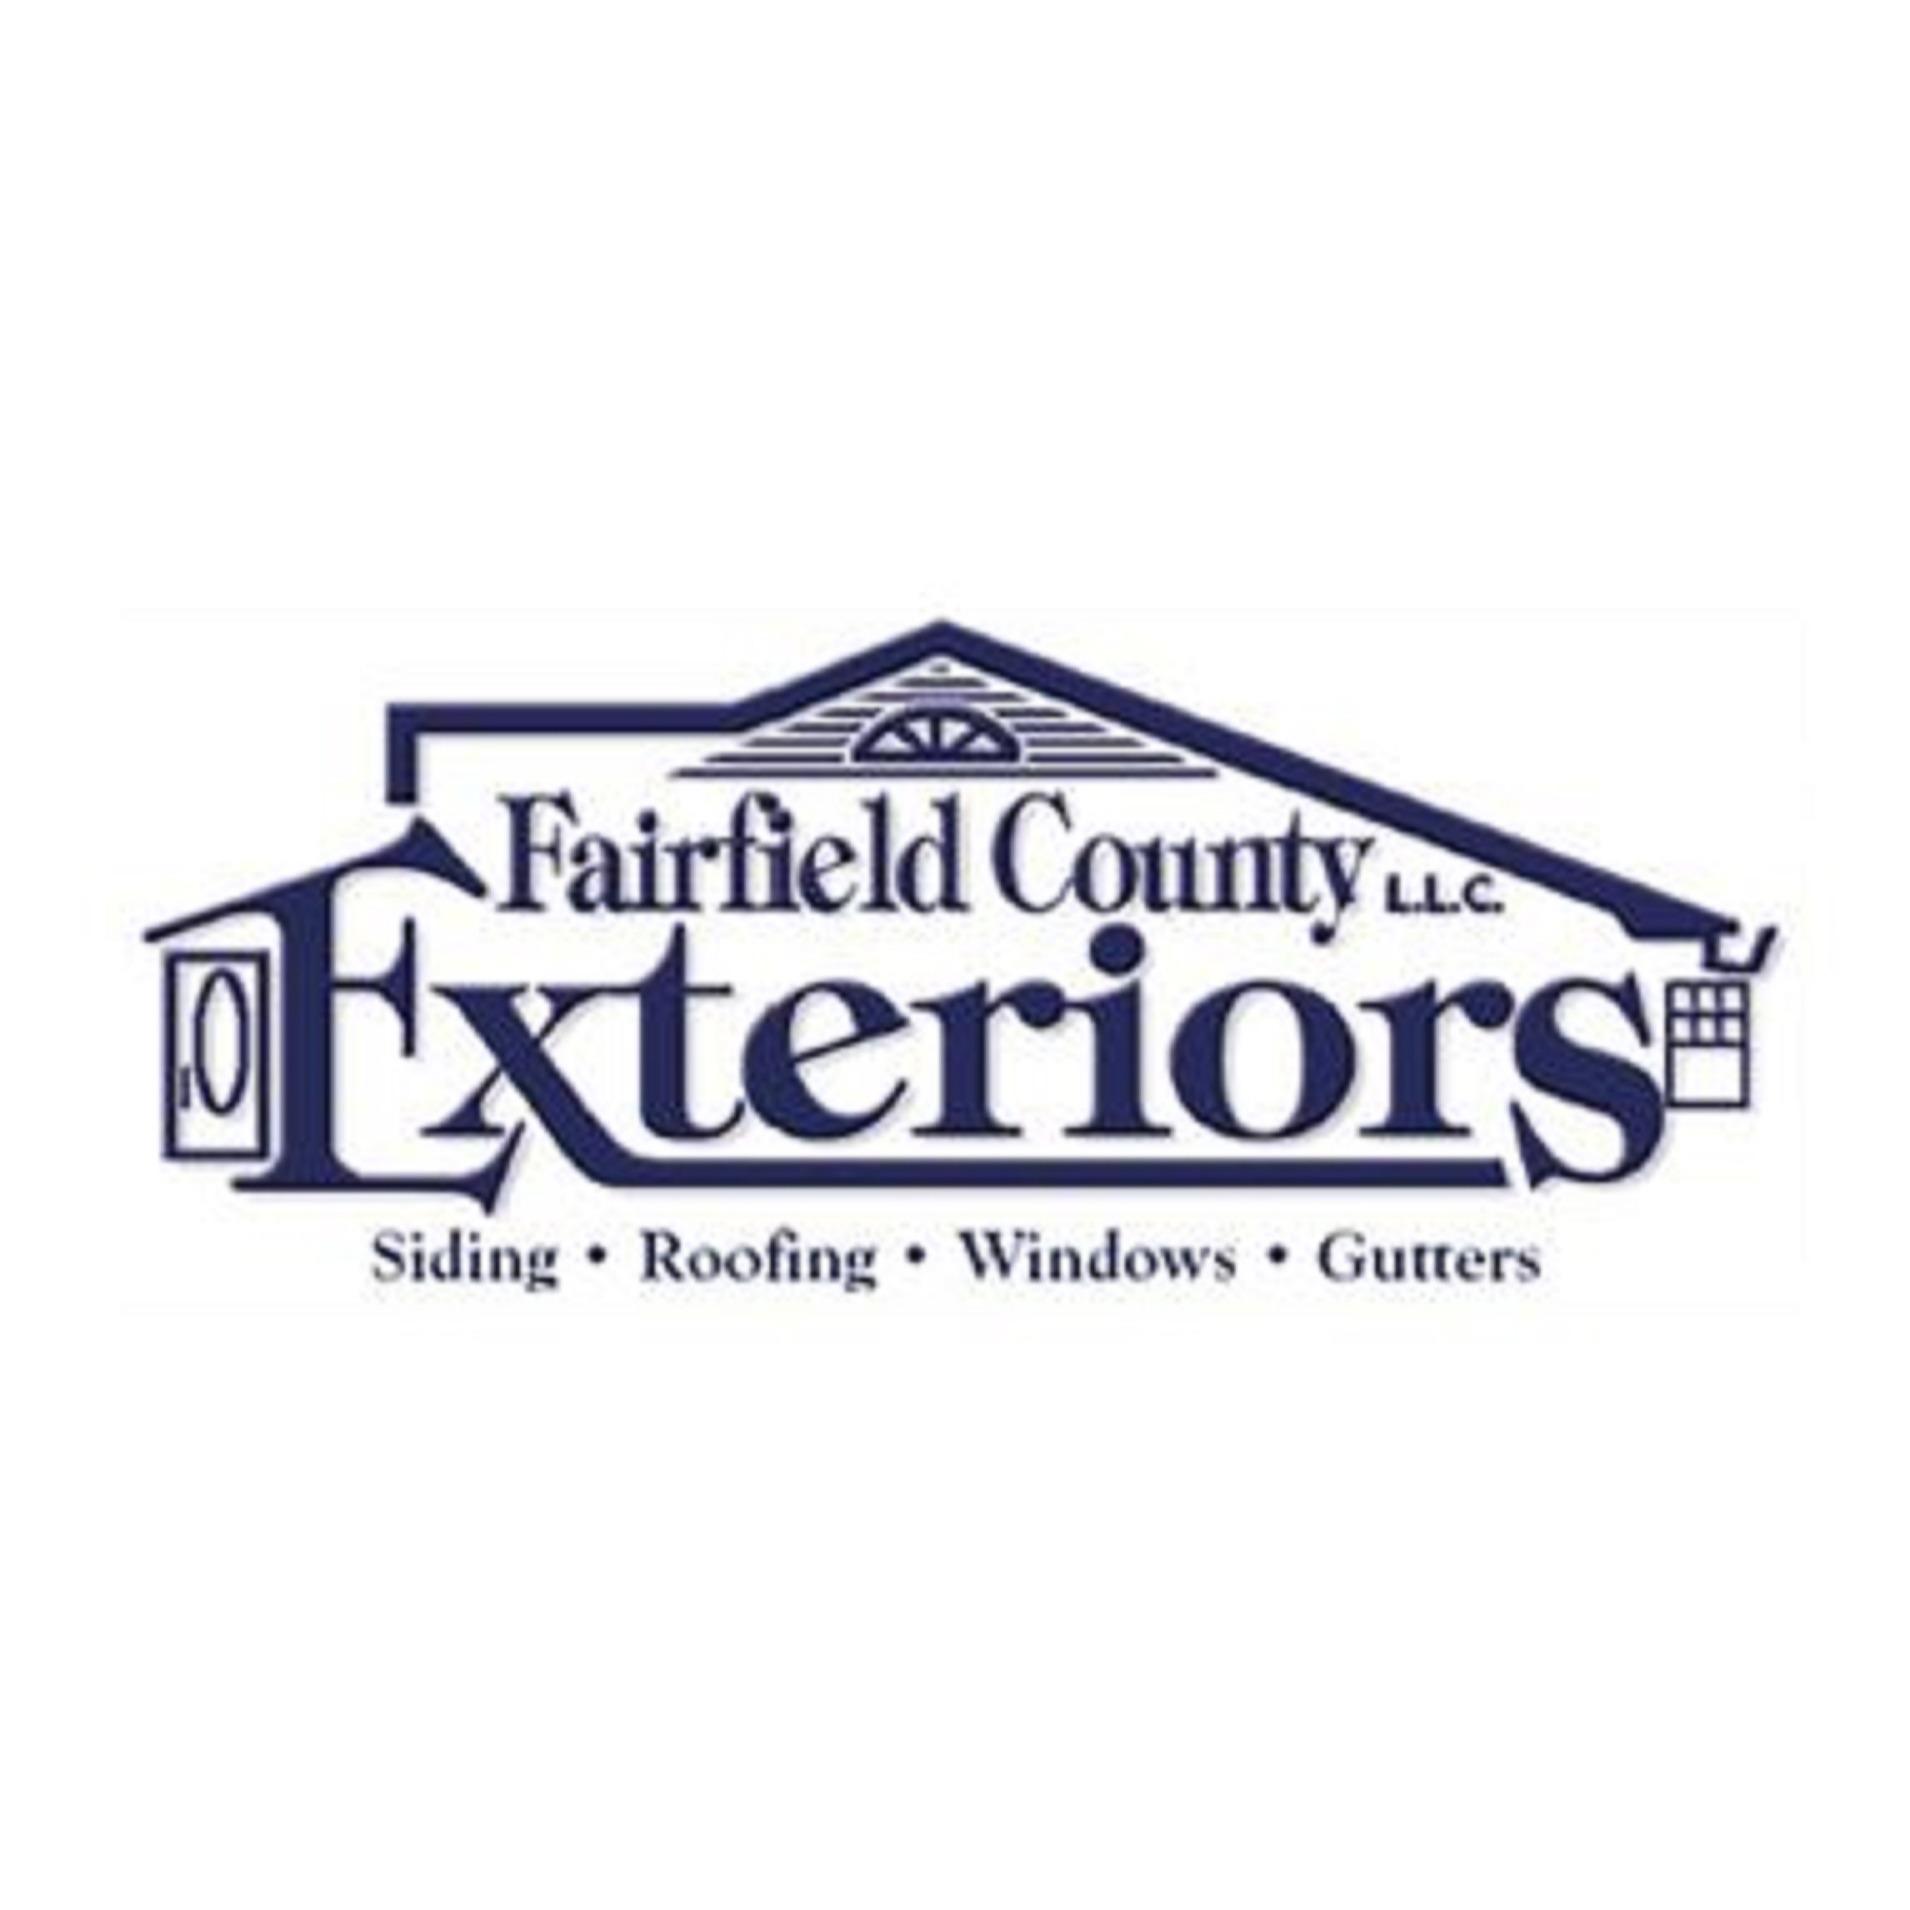 Fairfield County Exteriors Logo